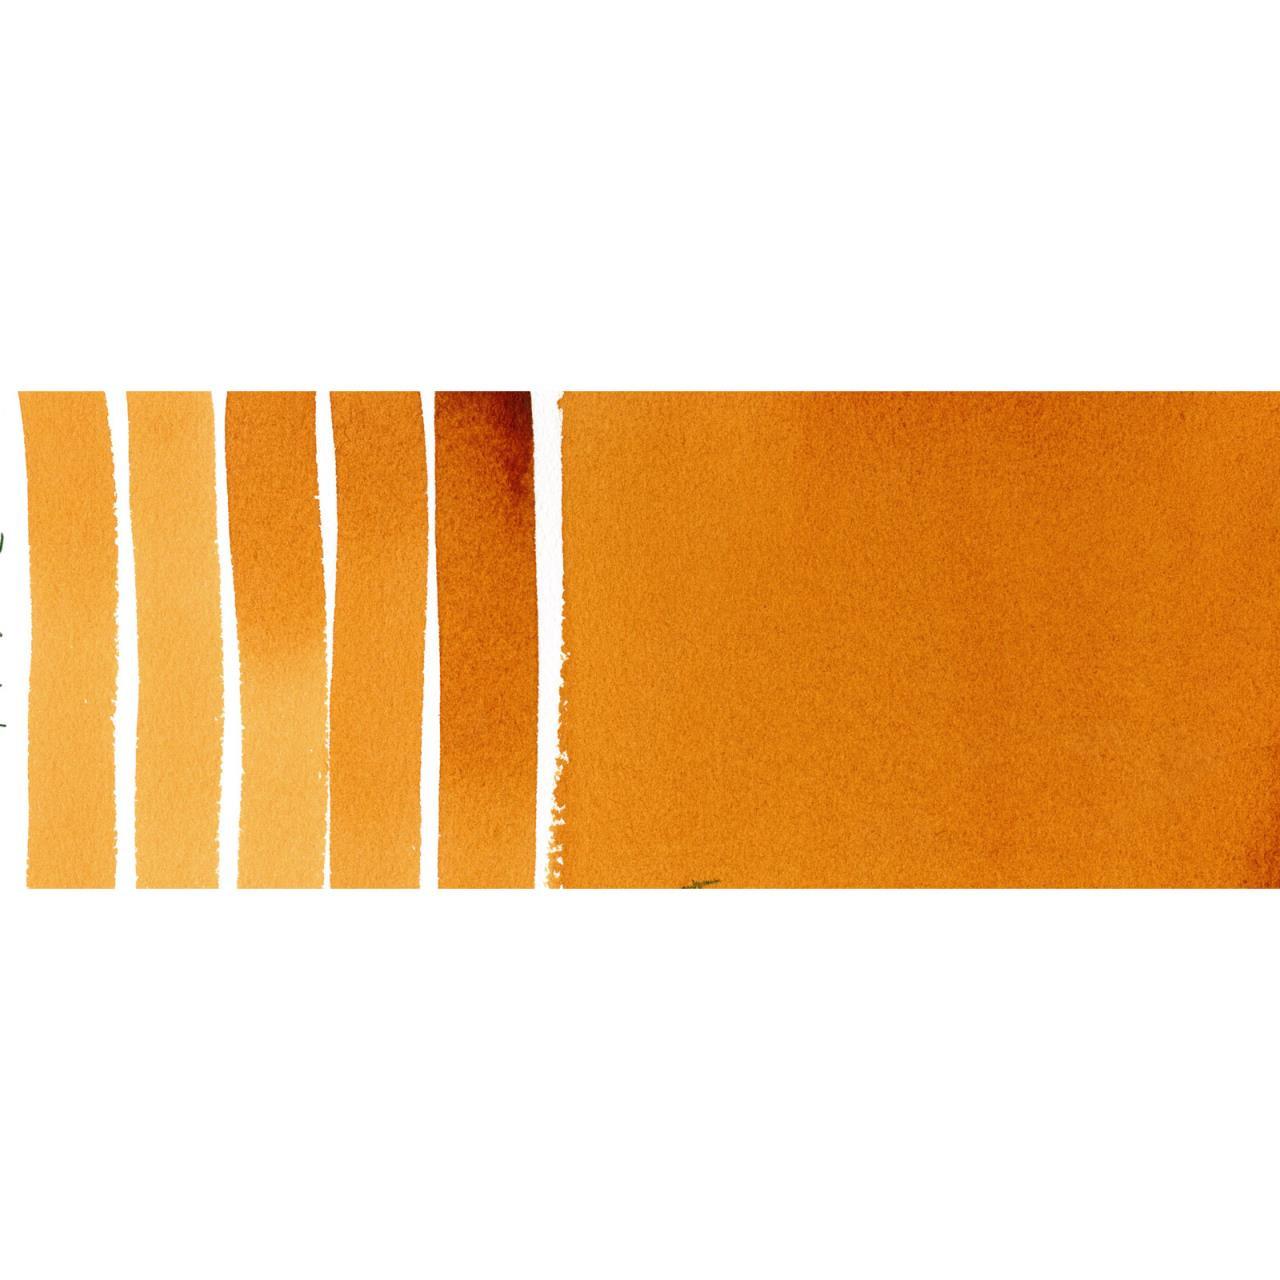 Quinacridone Deep Gold, DANIEL SMITH Extra Fine Watercolors 5ml Tubes -